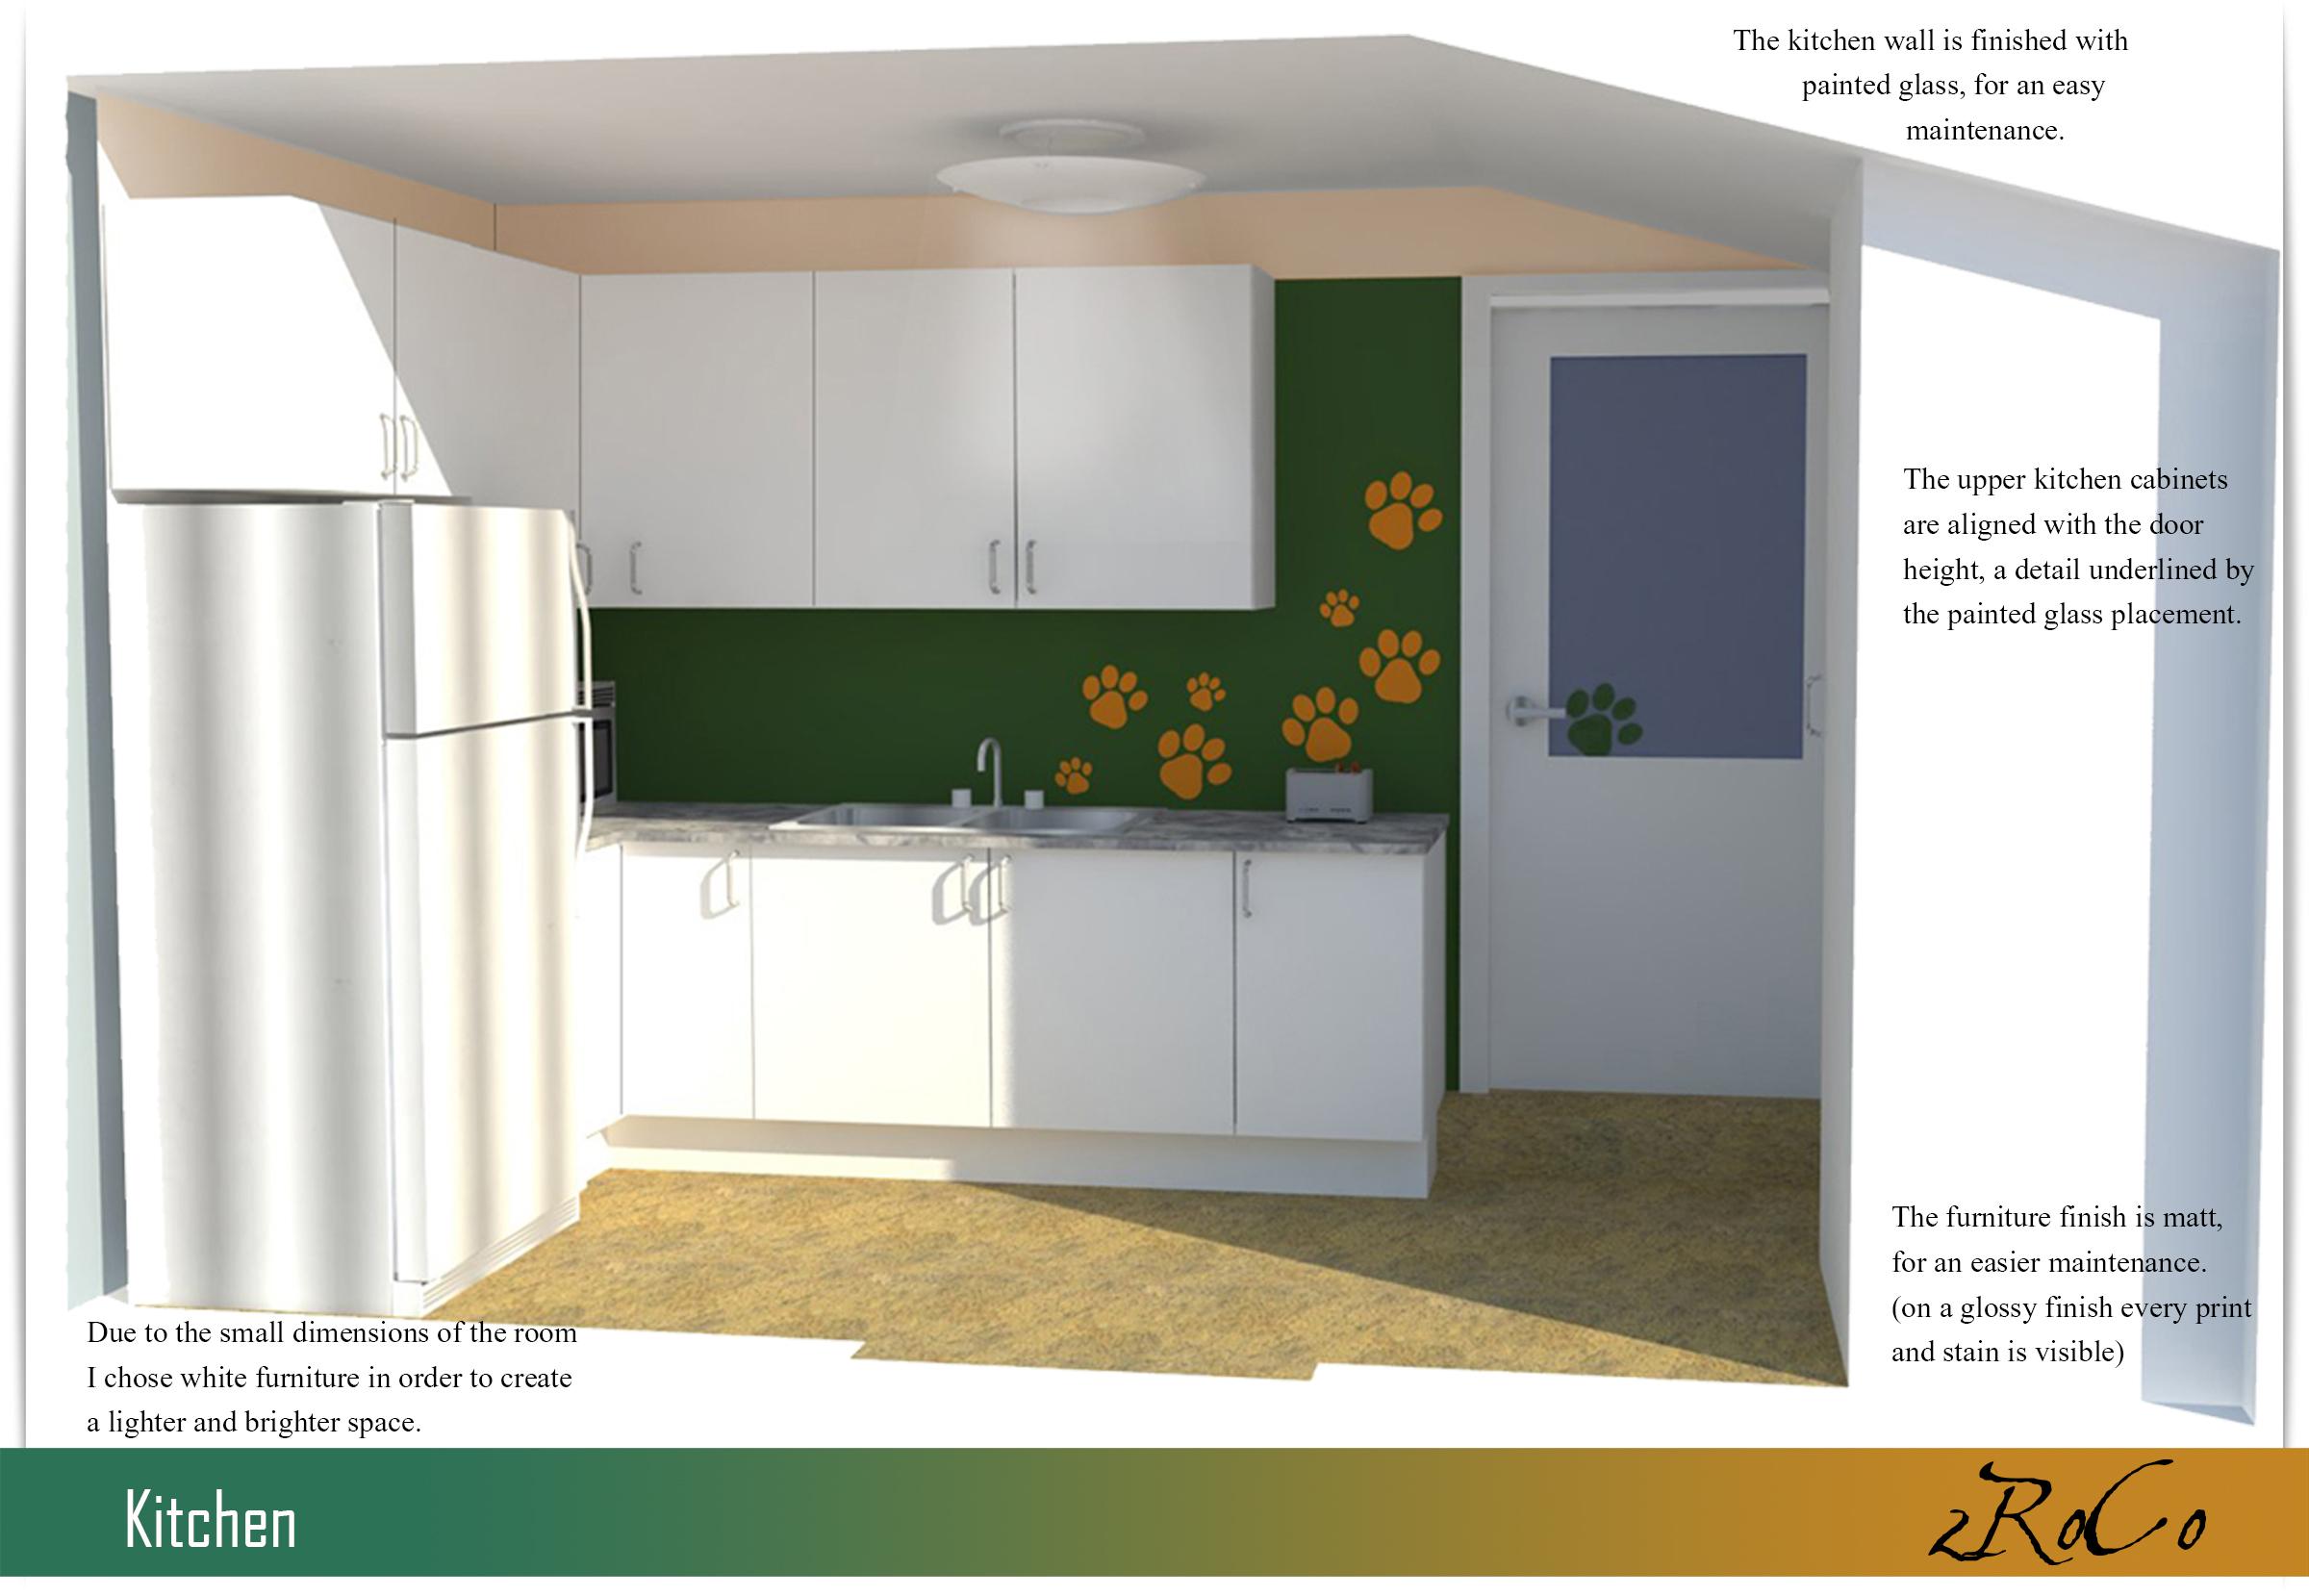 Store Design Project Designed By 2roco Tiny Lobby Kitchen Sacramento California United